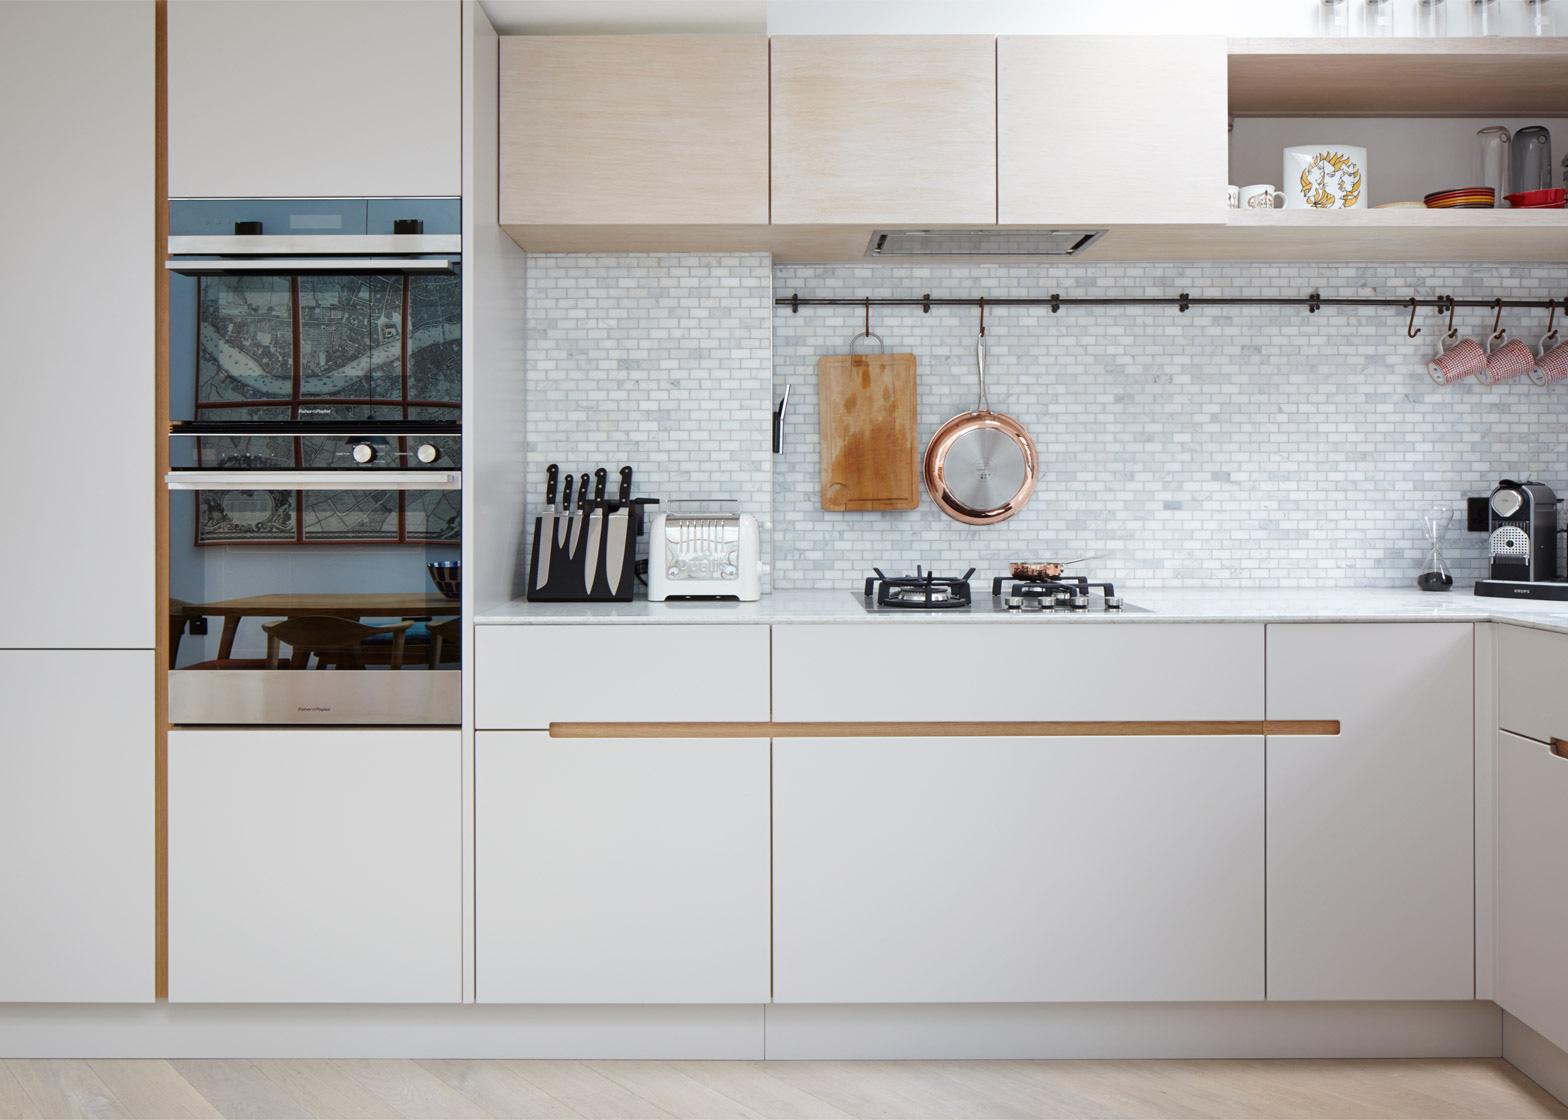 lambeth-marsh-house-fraher-architects-residential-renovation-london-uk_dezeen_1568_7